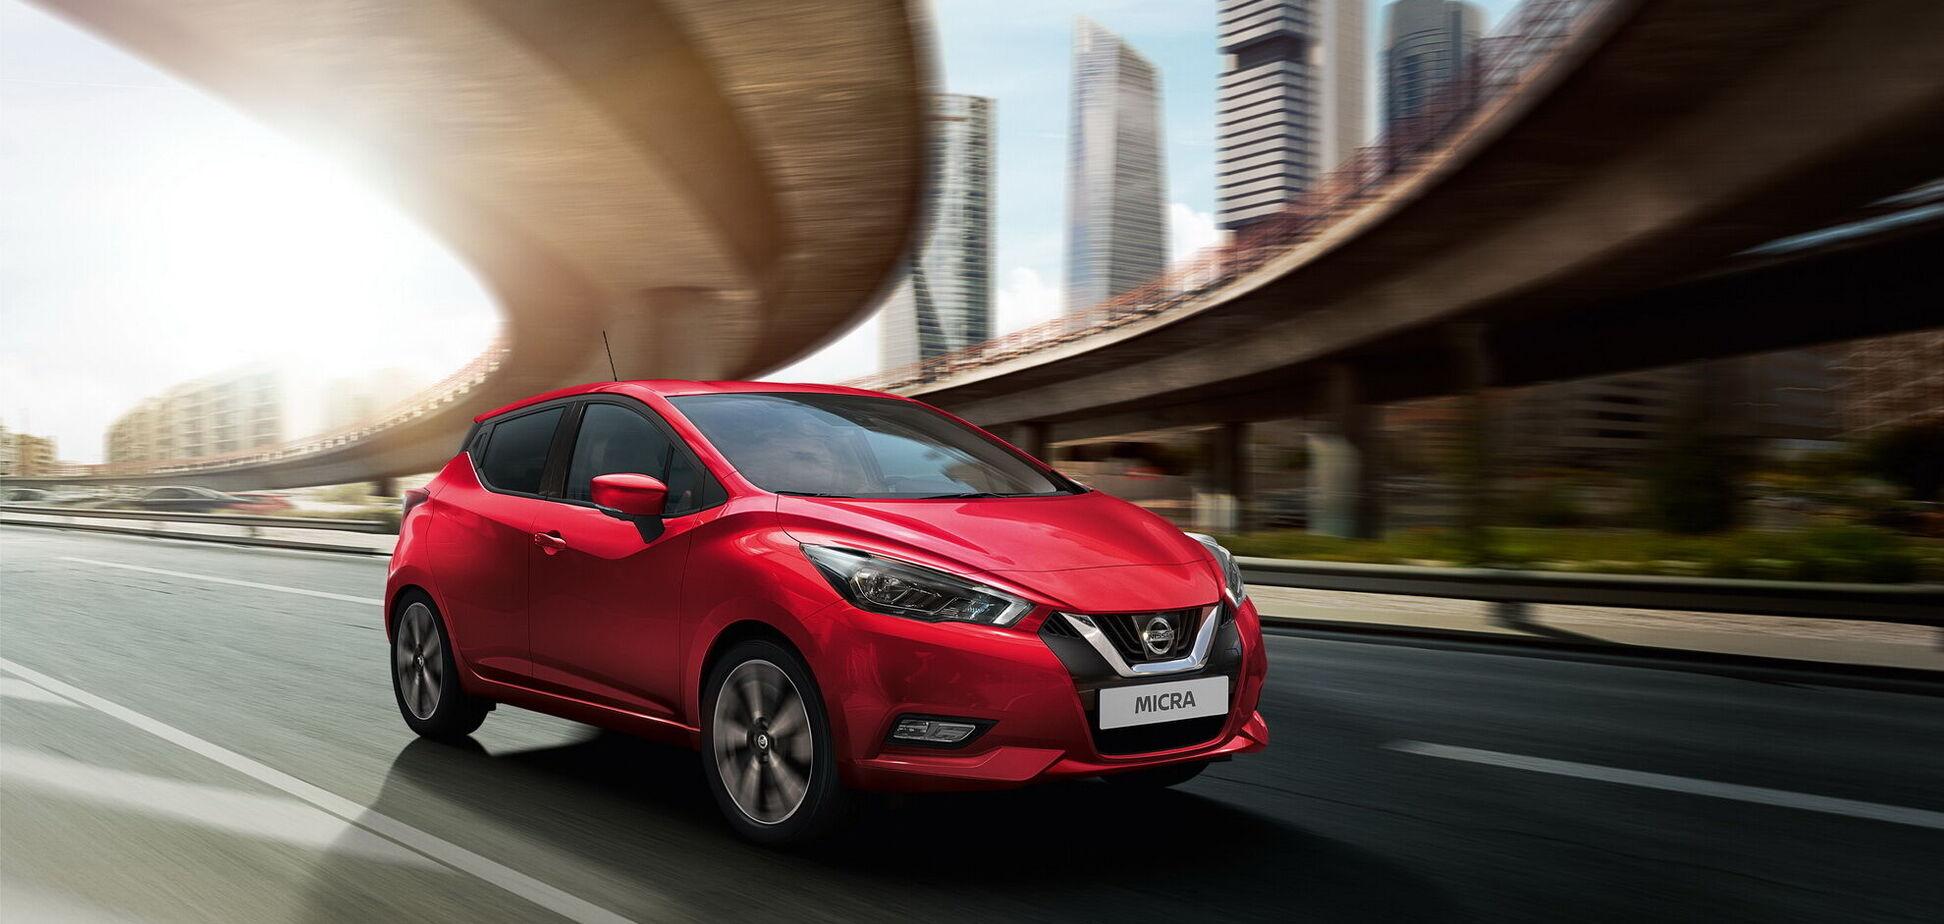 Nissan обновил популярную компактную модель Micra